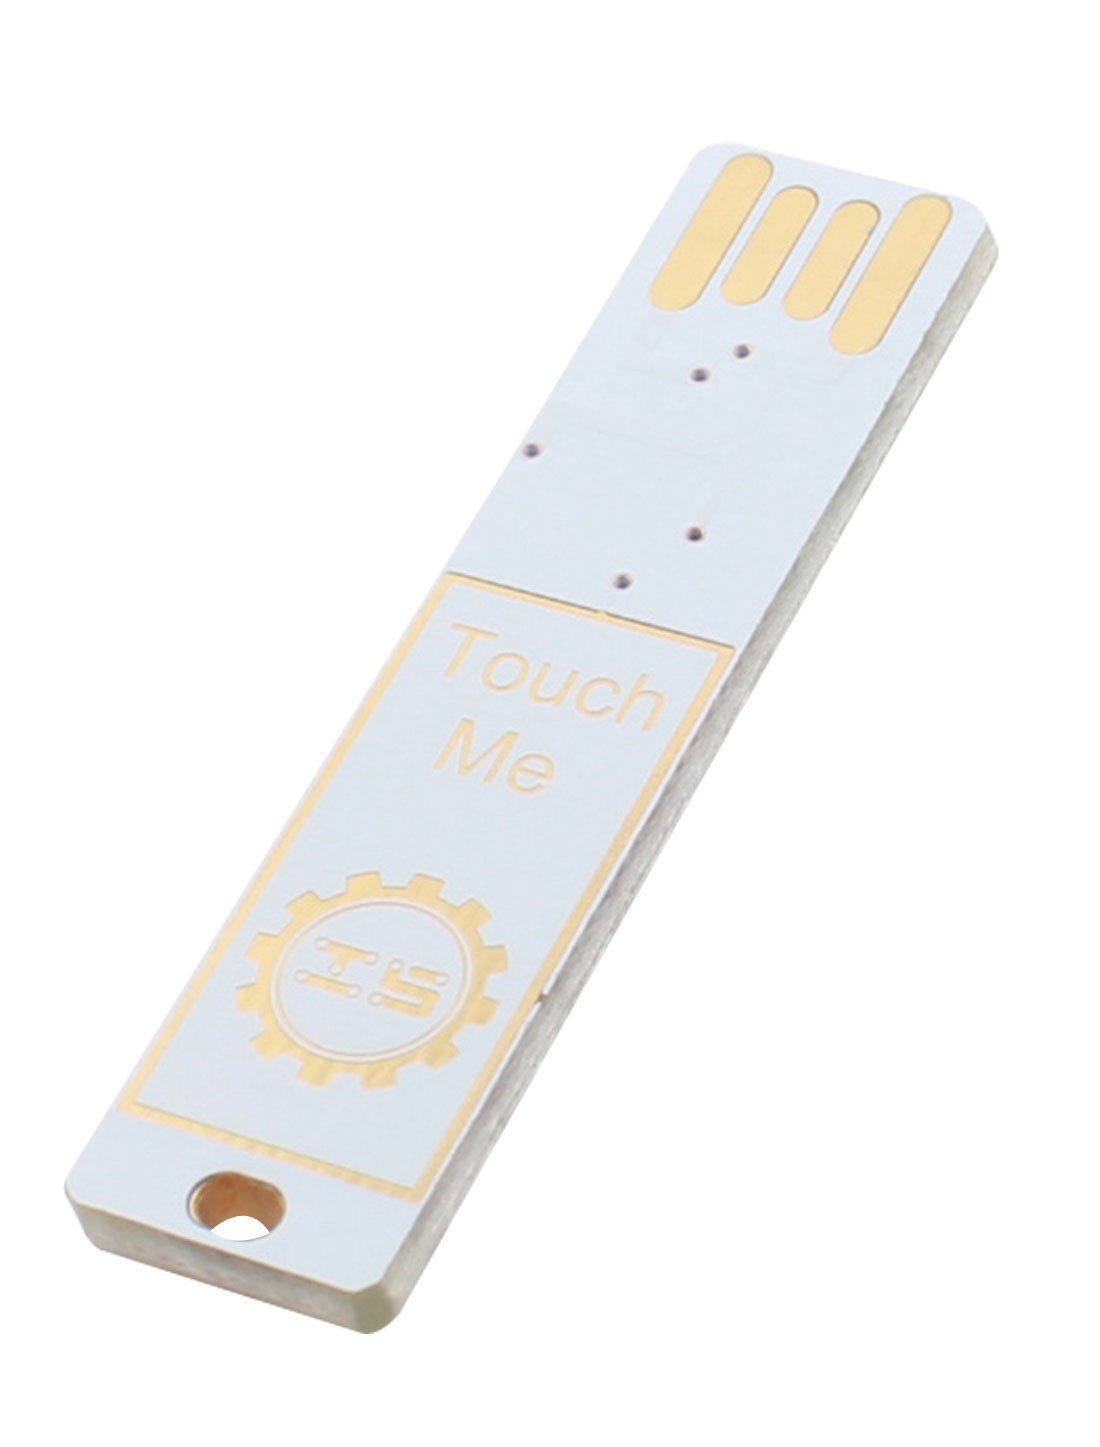 USB Blanco SMD 5630 4LEDs táctil interruptor de la luz de la lámpara LED Para PC portátil: Amazon.com: Industrial & Scientific